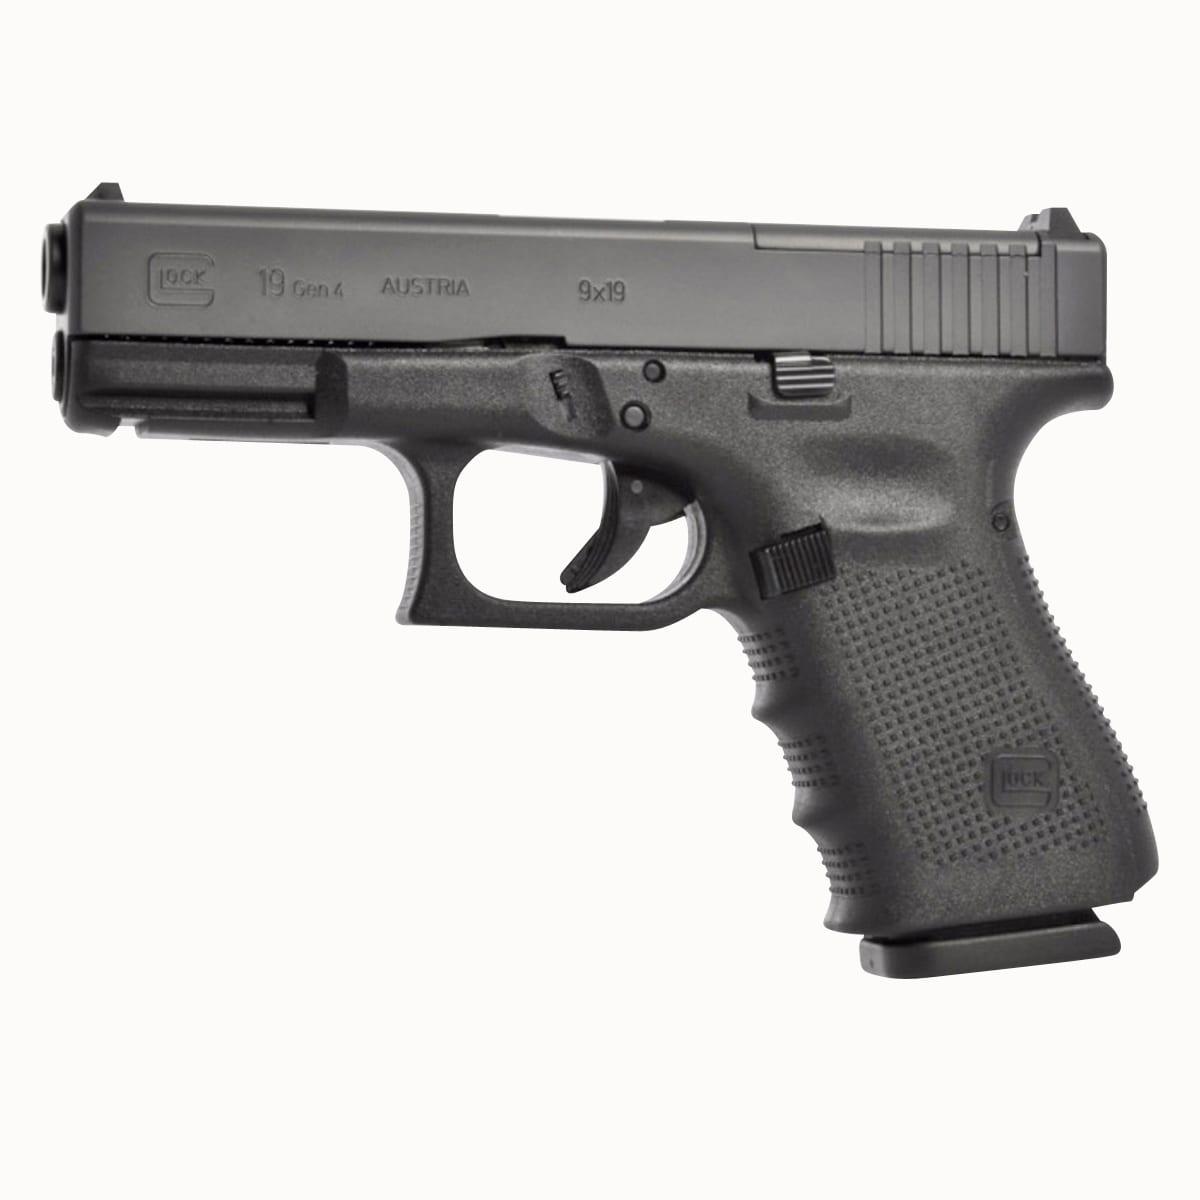 Glock UG1950203MOSTB G19 Gen4 MOS 9mm Luger 4.02